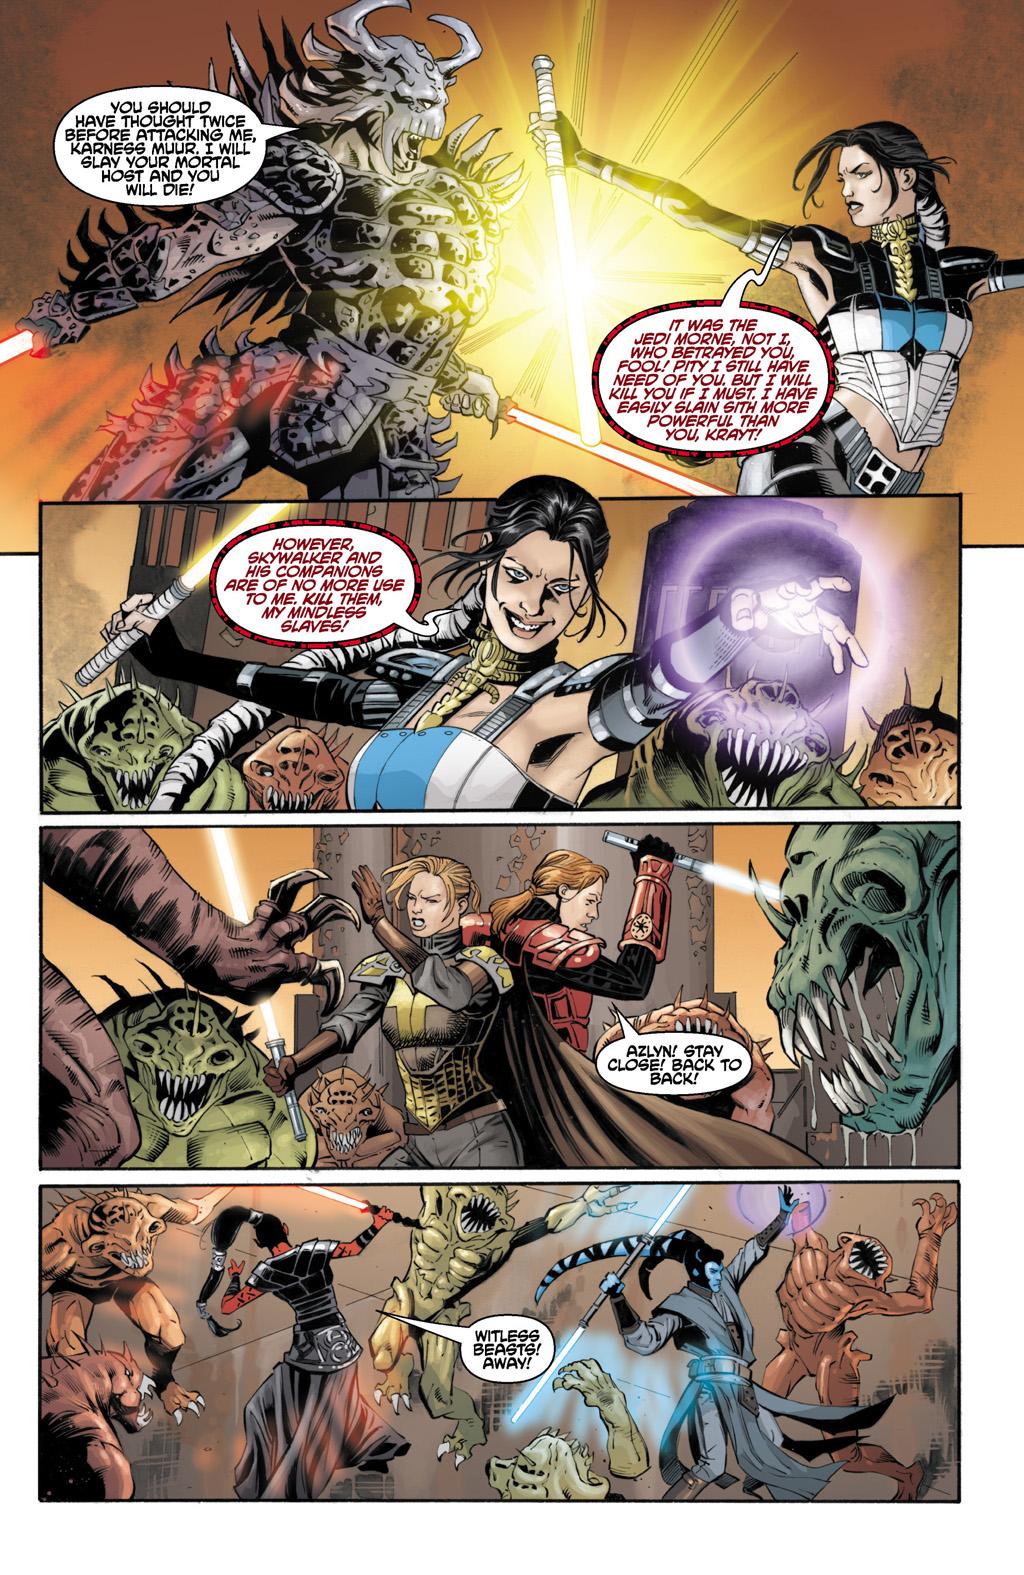 Celeste Morne Defeats Darth Krayt